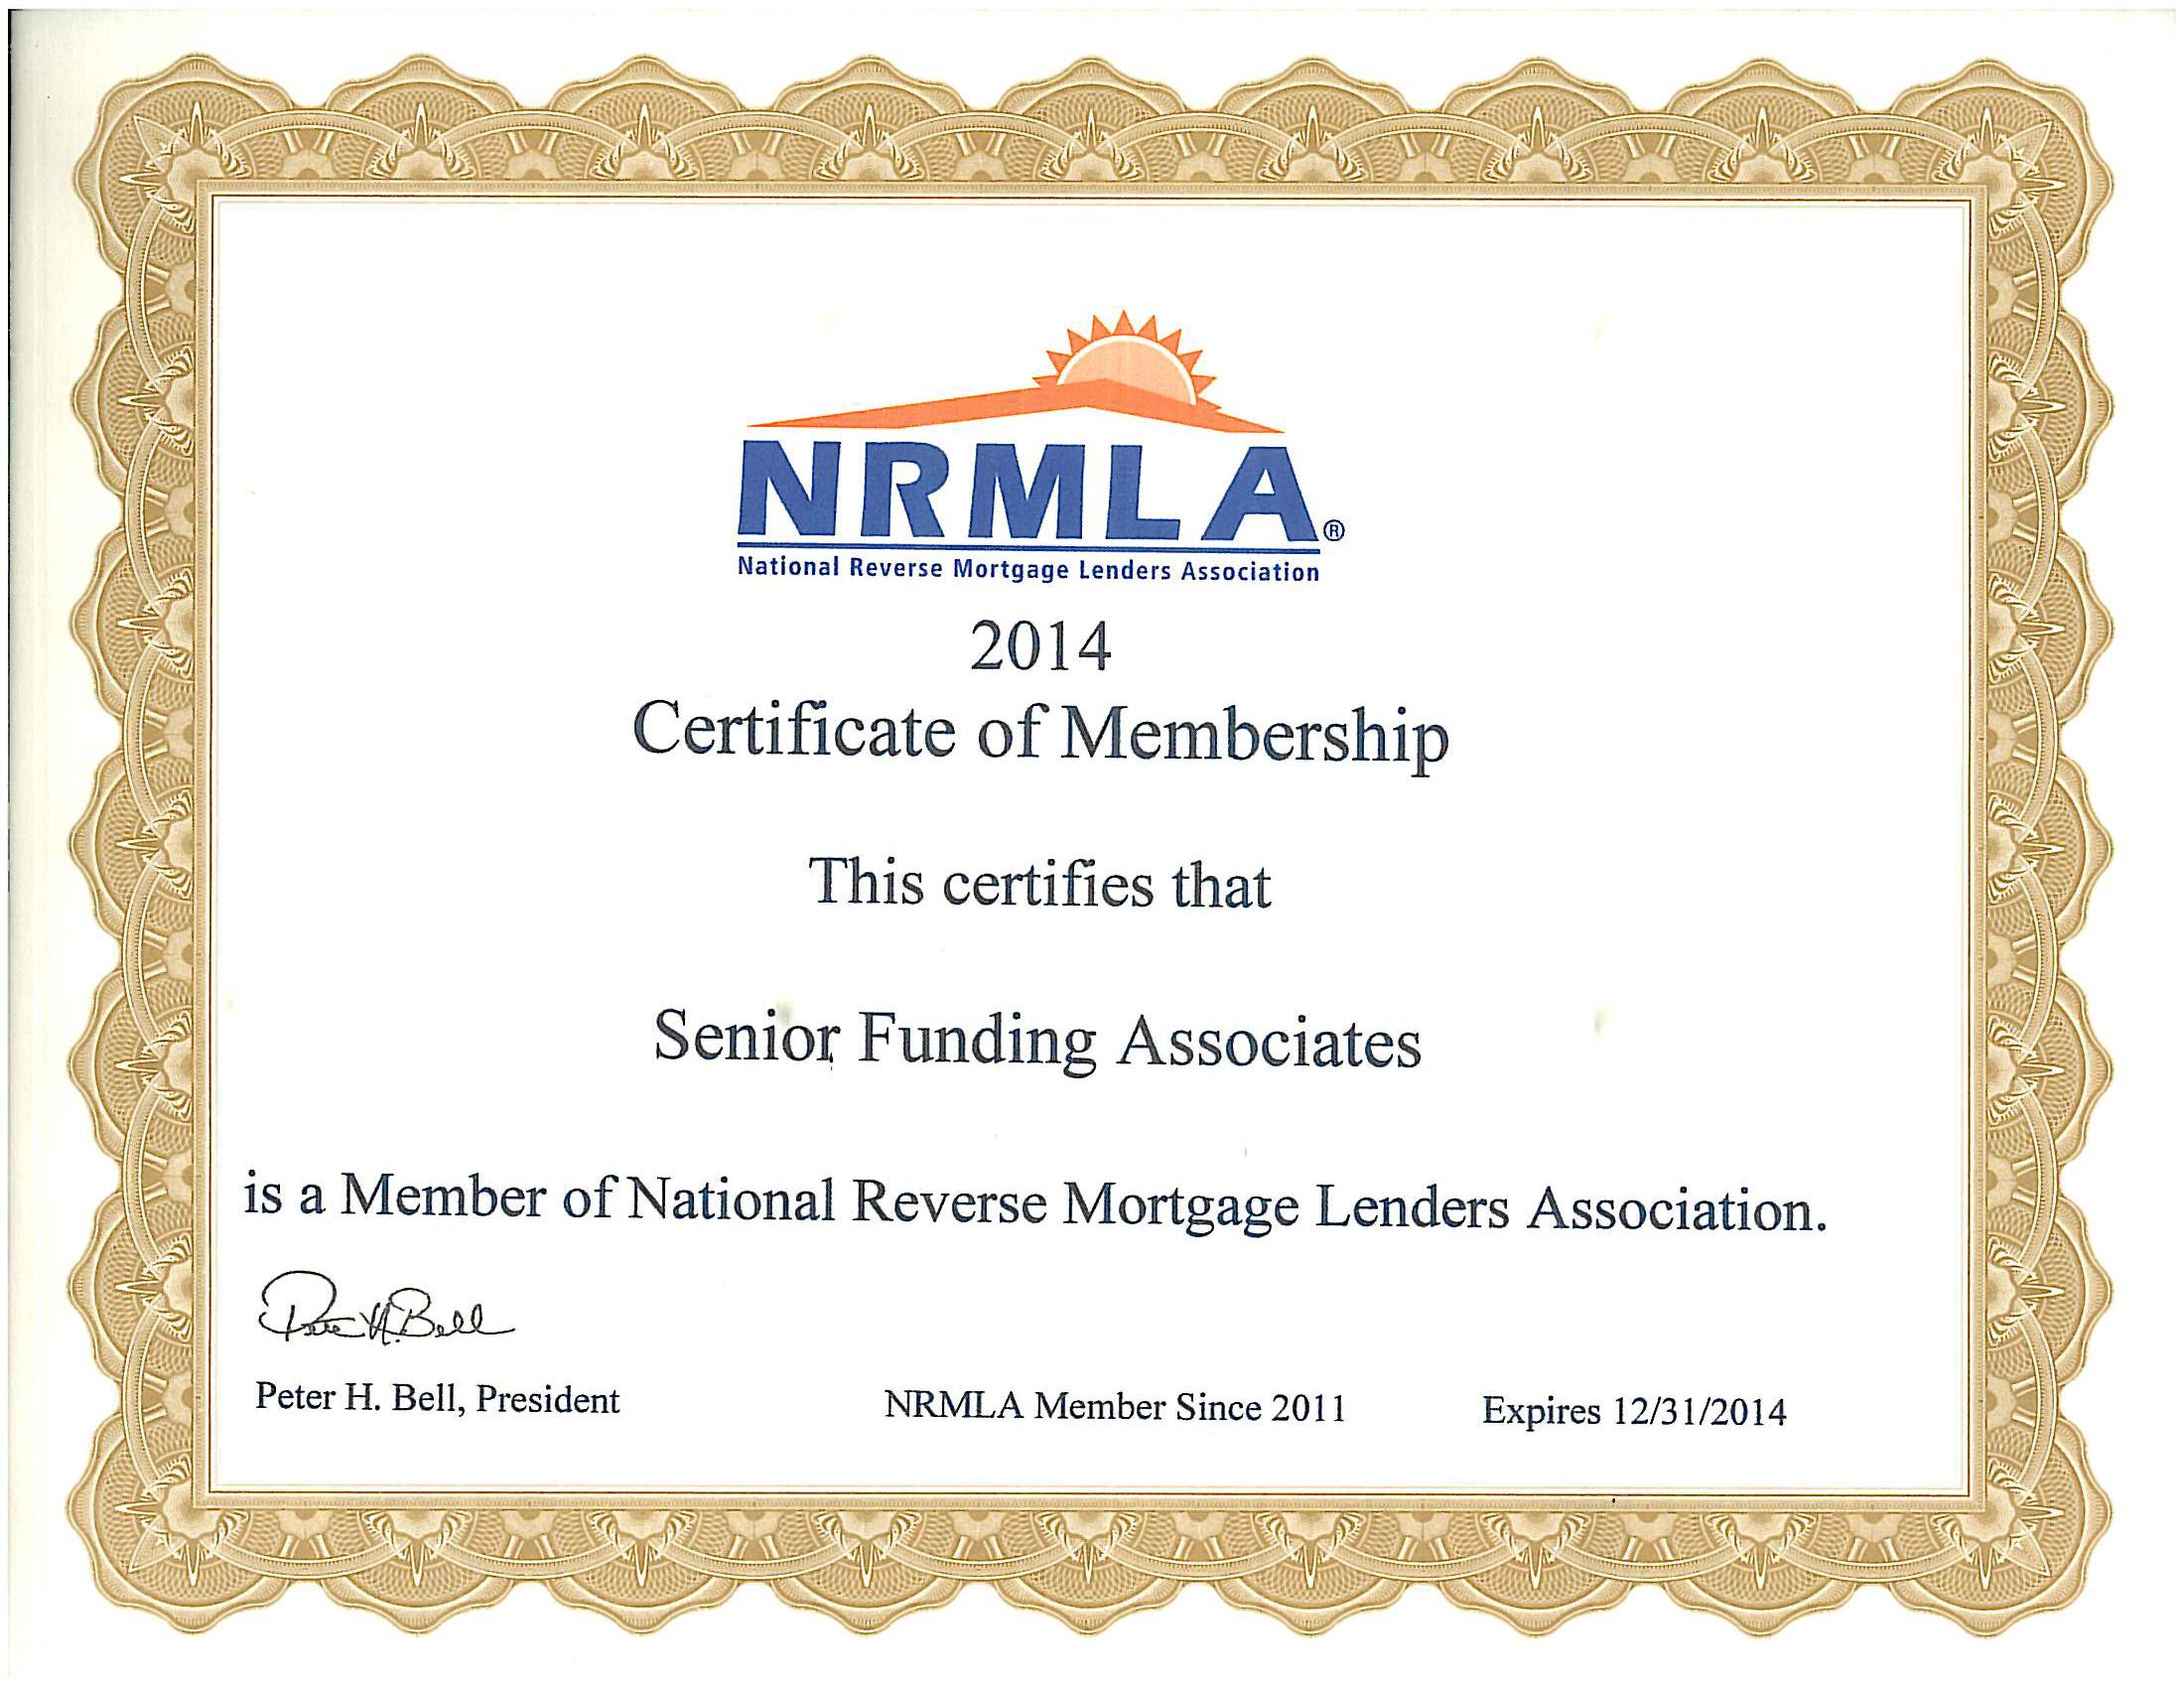 Nrmla membership certificate dean jones reverse mortgages certiface1 certiface2 1betcityfo Images